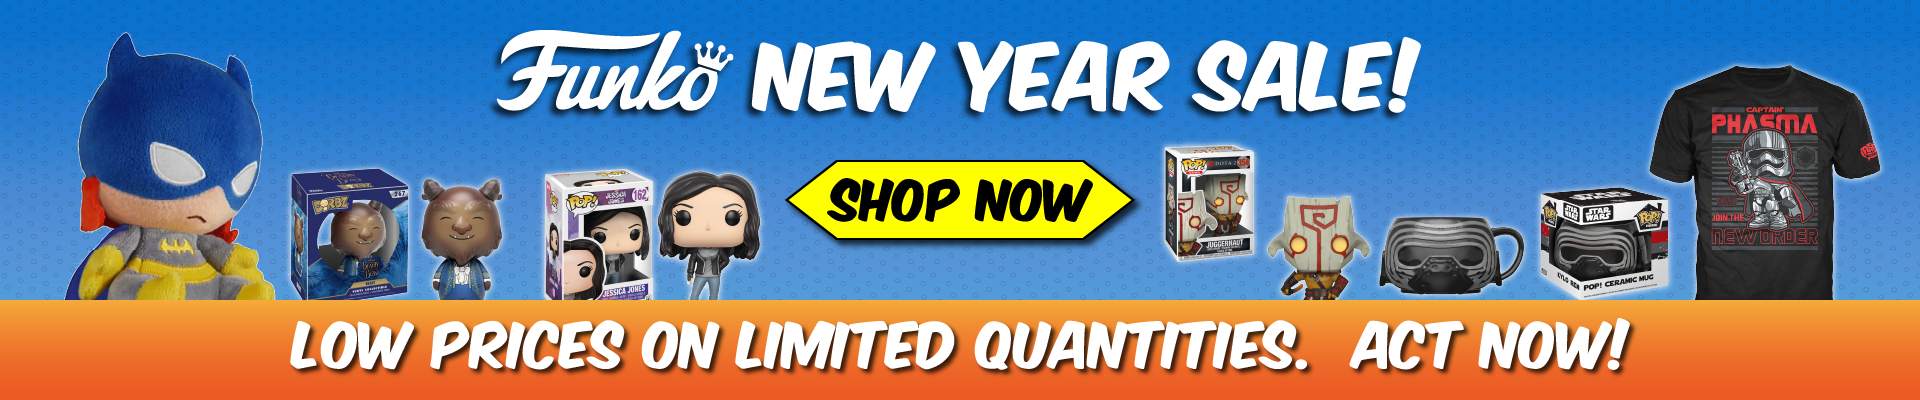 Funko, New Year, Sale